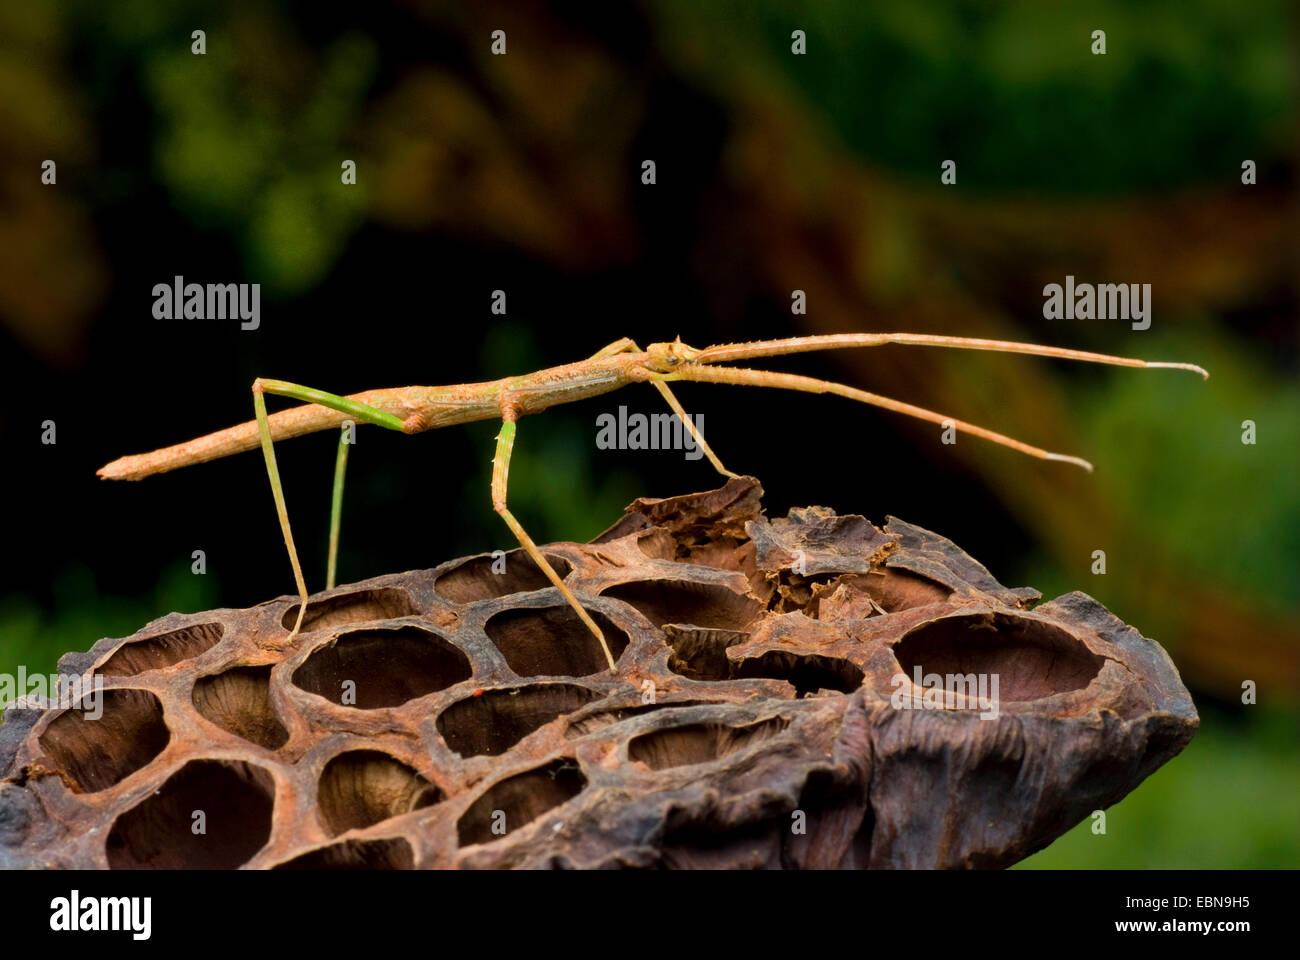 Stick vietnamita Bug (Ramulus Artemis, Baculum artemis), su una nave di sementi Immagini Stock